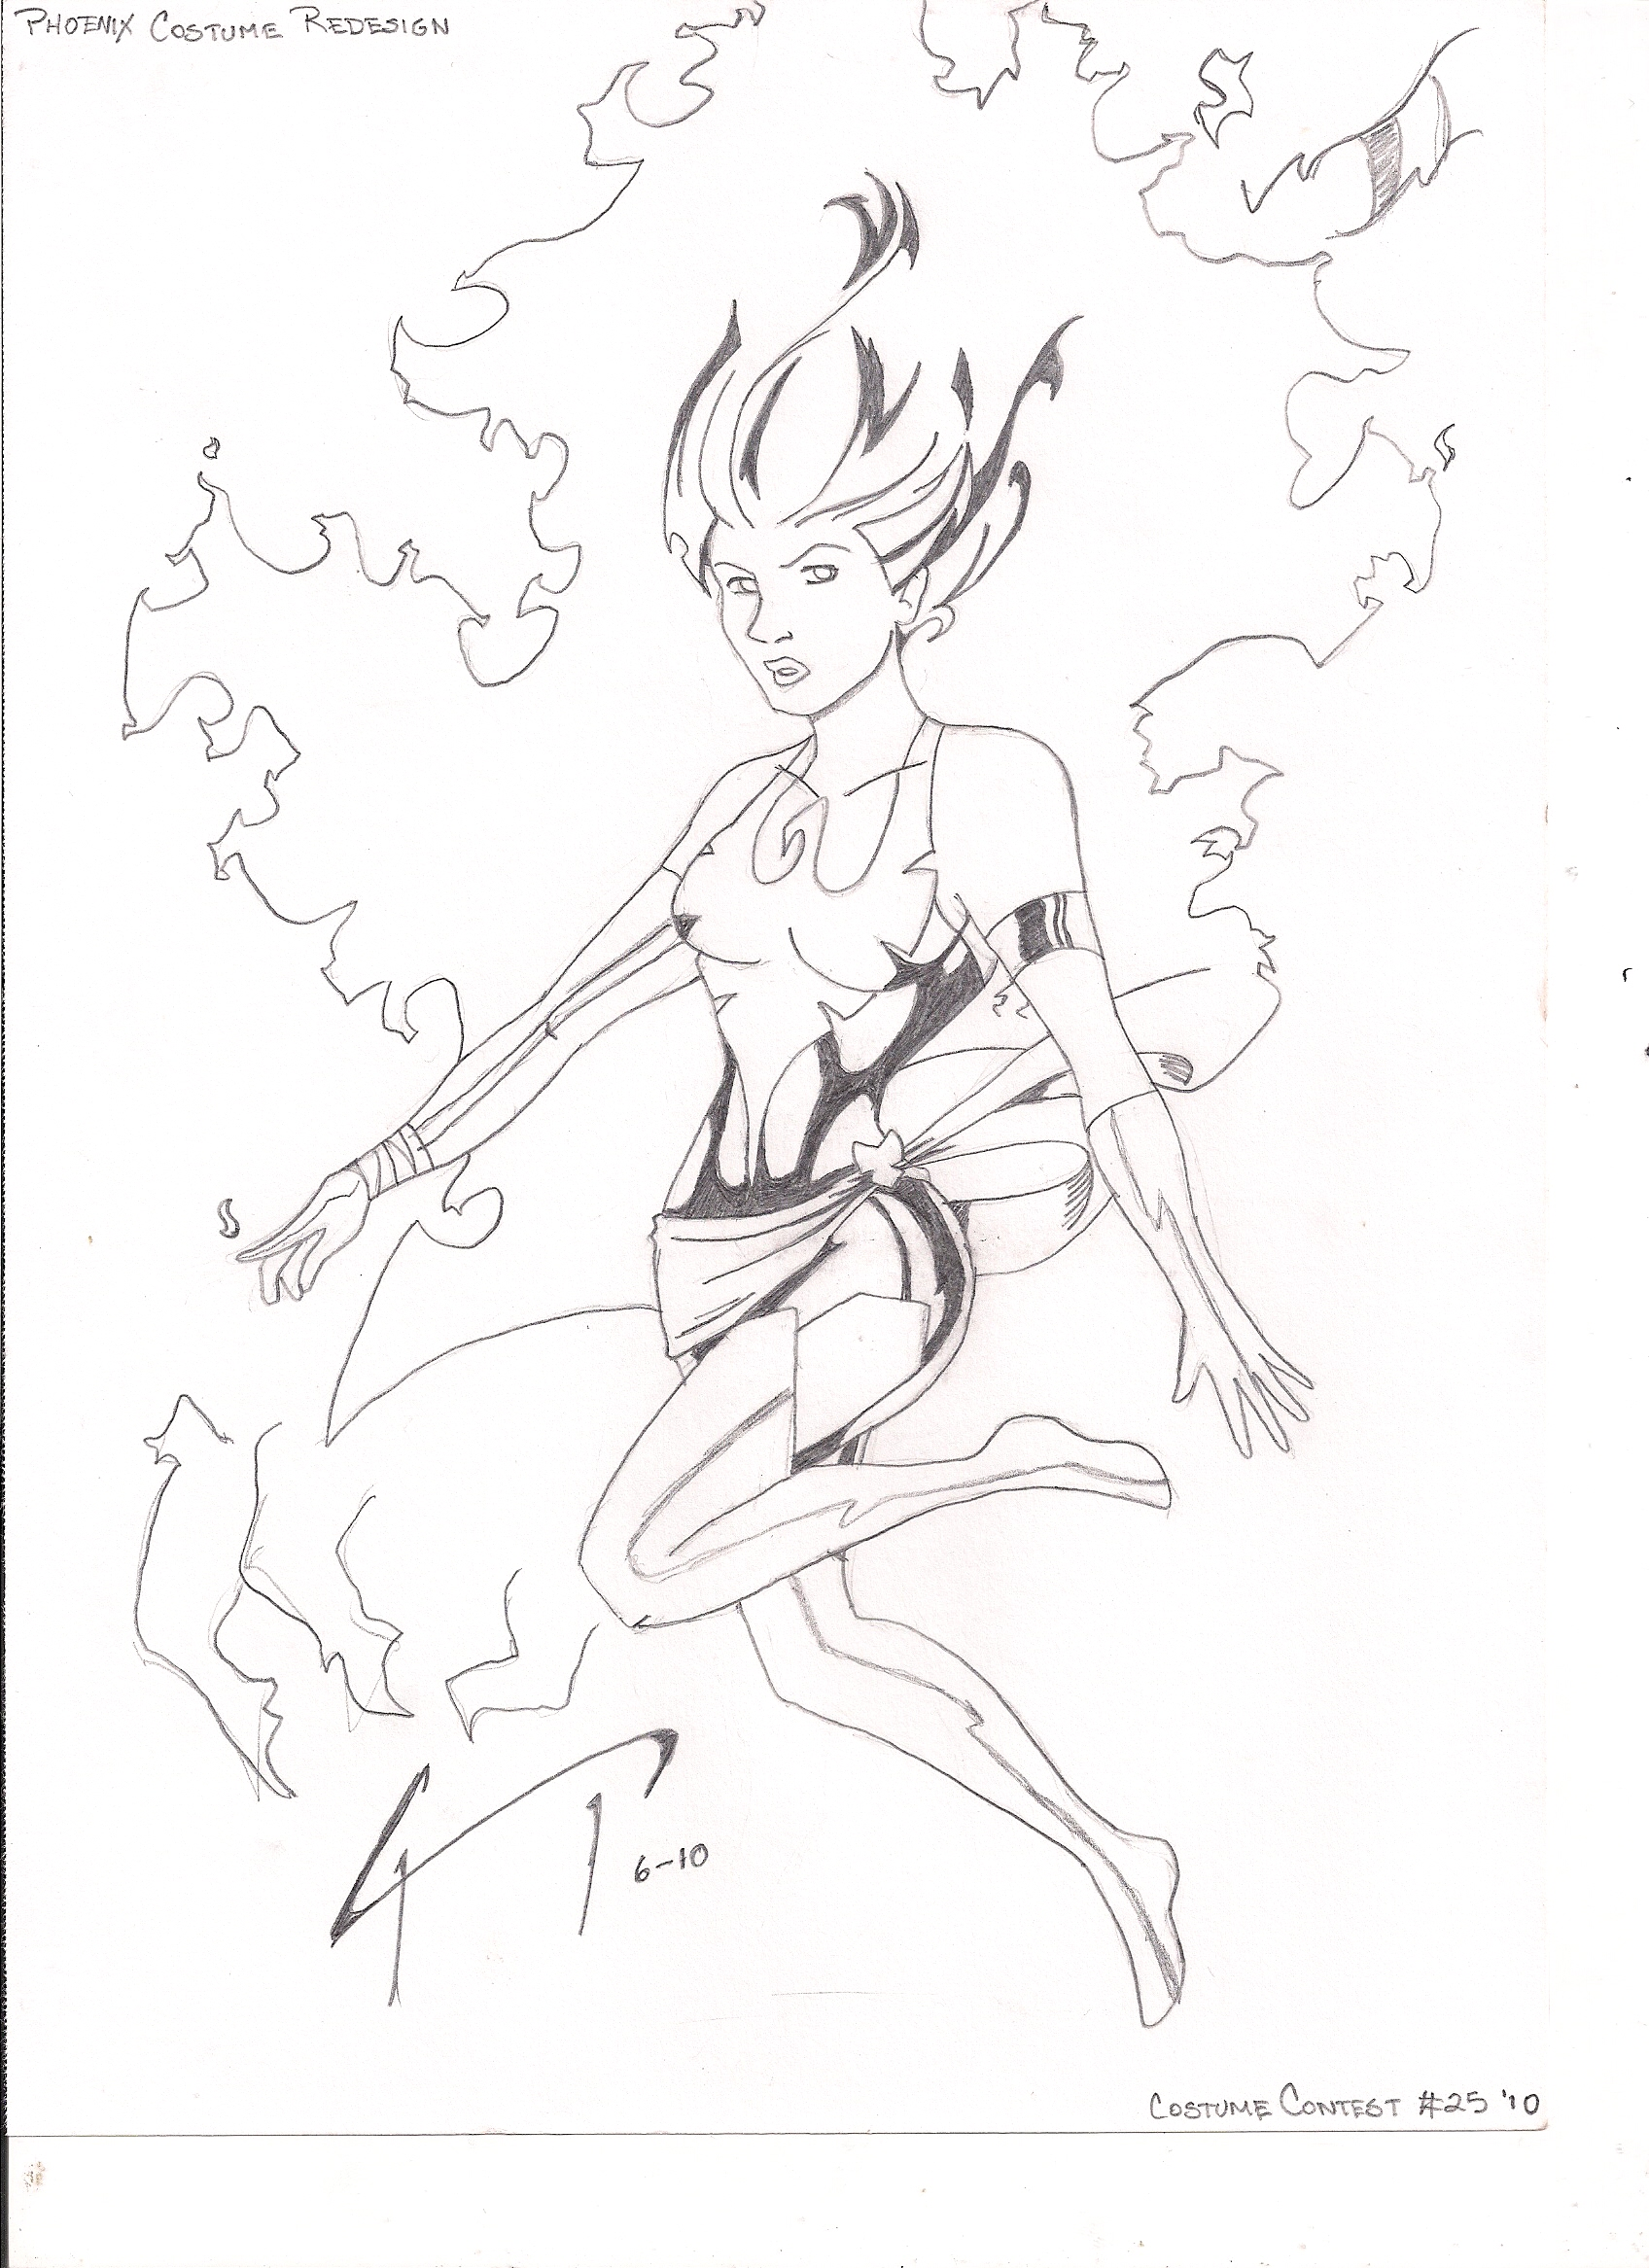 1696x2333 Recent Drawings Phoenix Costume Redesign